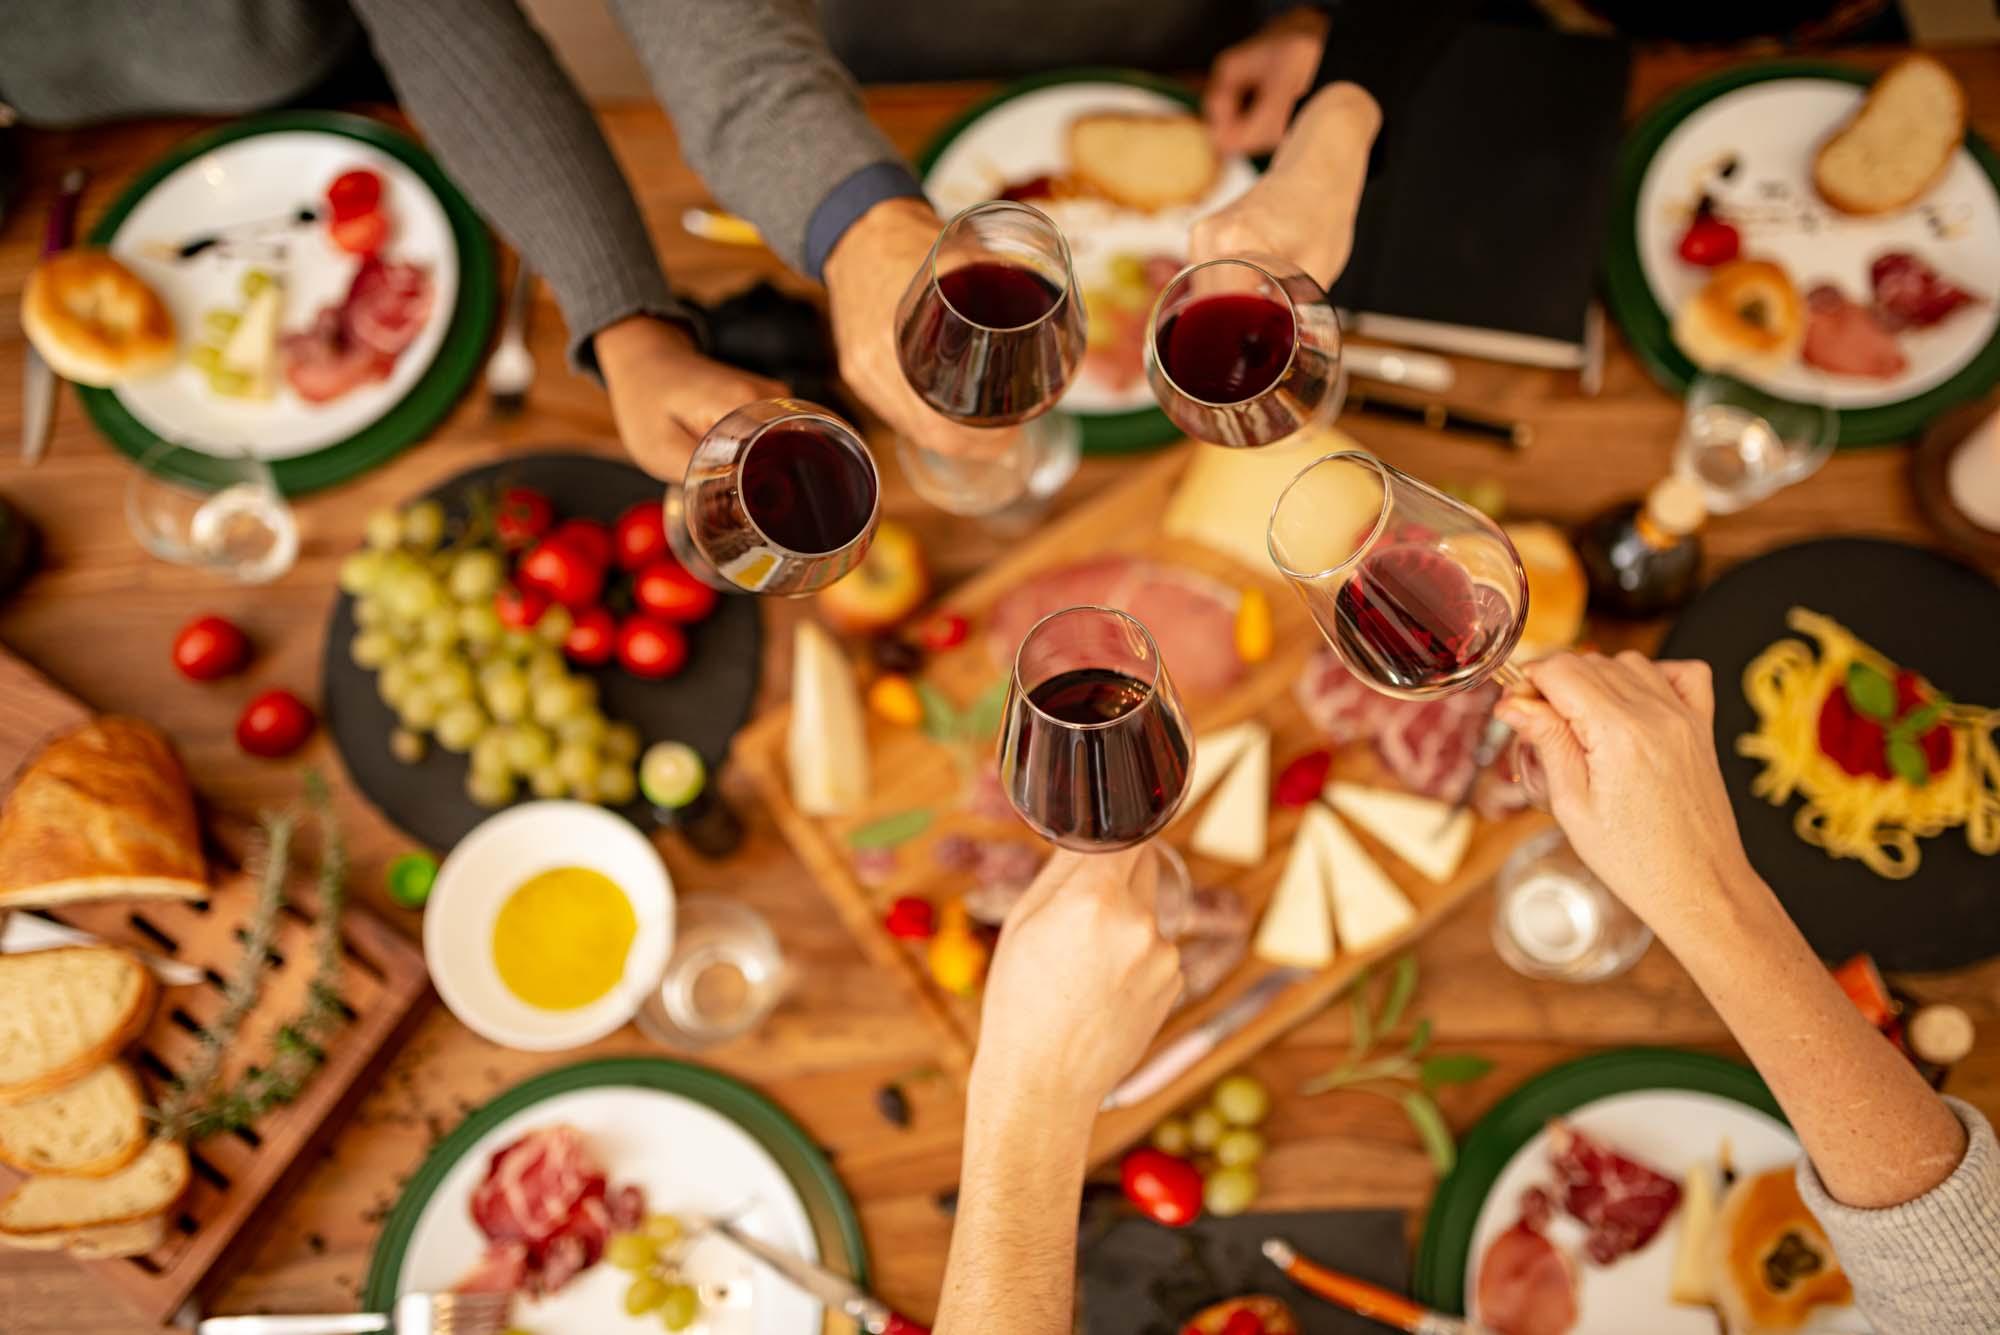 Cucina Amatoriale Cene Aziendali a Bologna